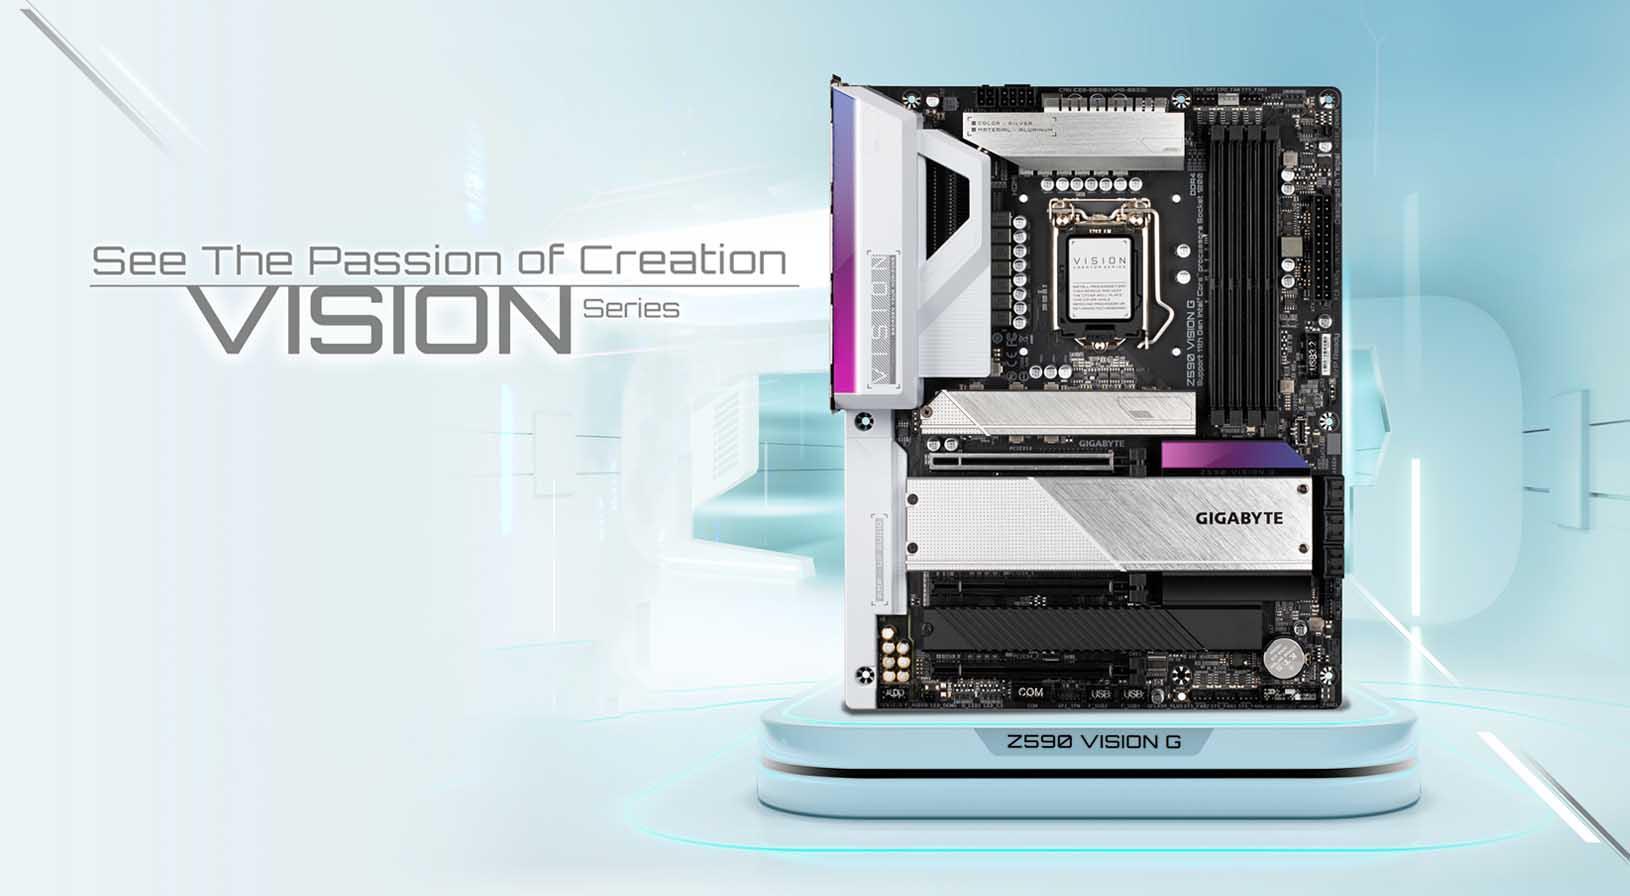 Z590 VISION G